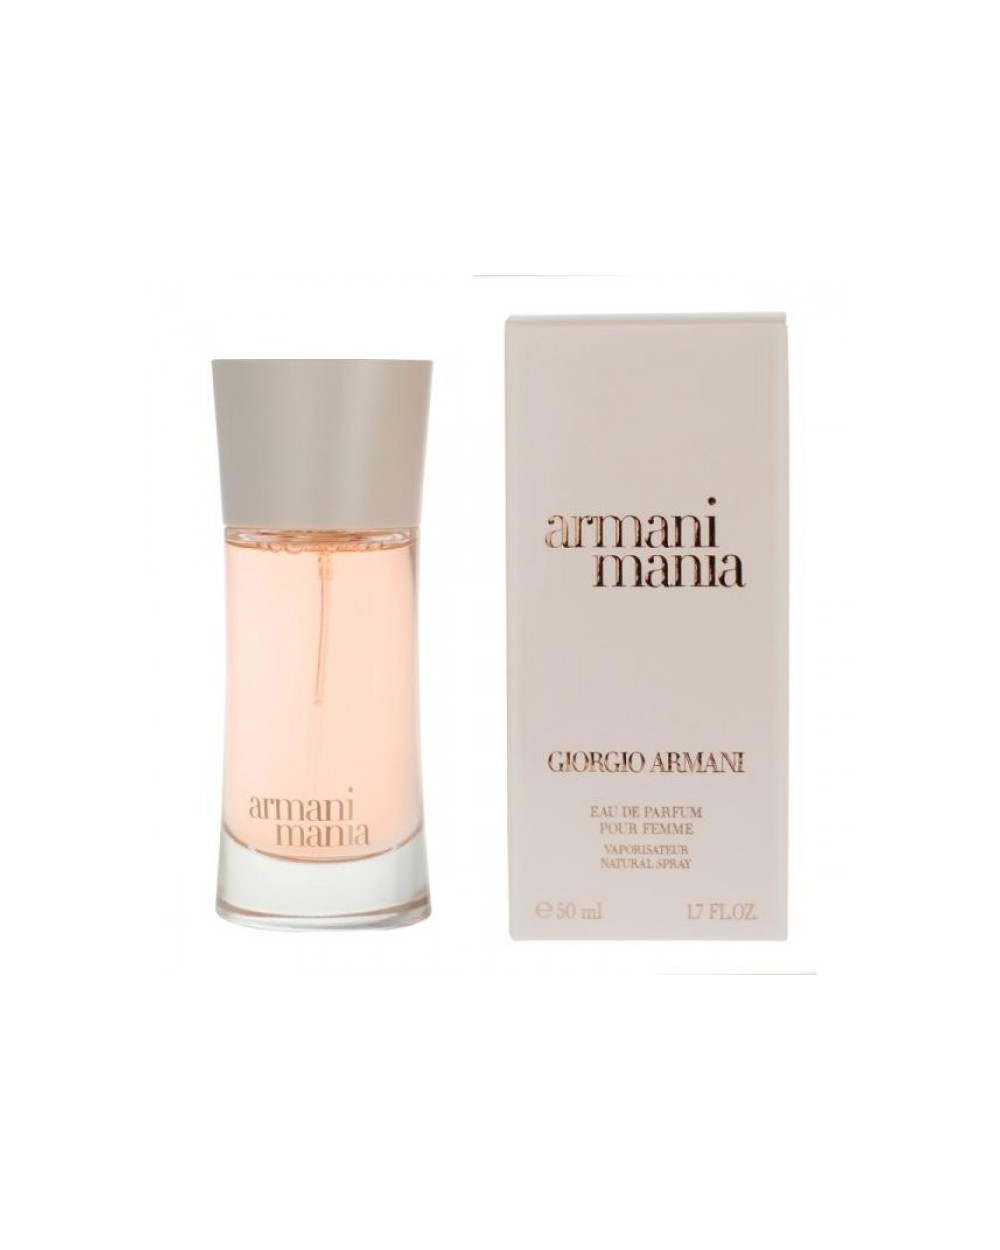 Armani Armani Mania Femme Eau De Parfum 50ml Sovrana Parfums